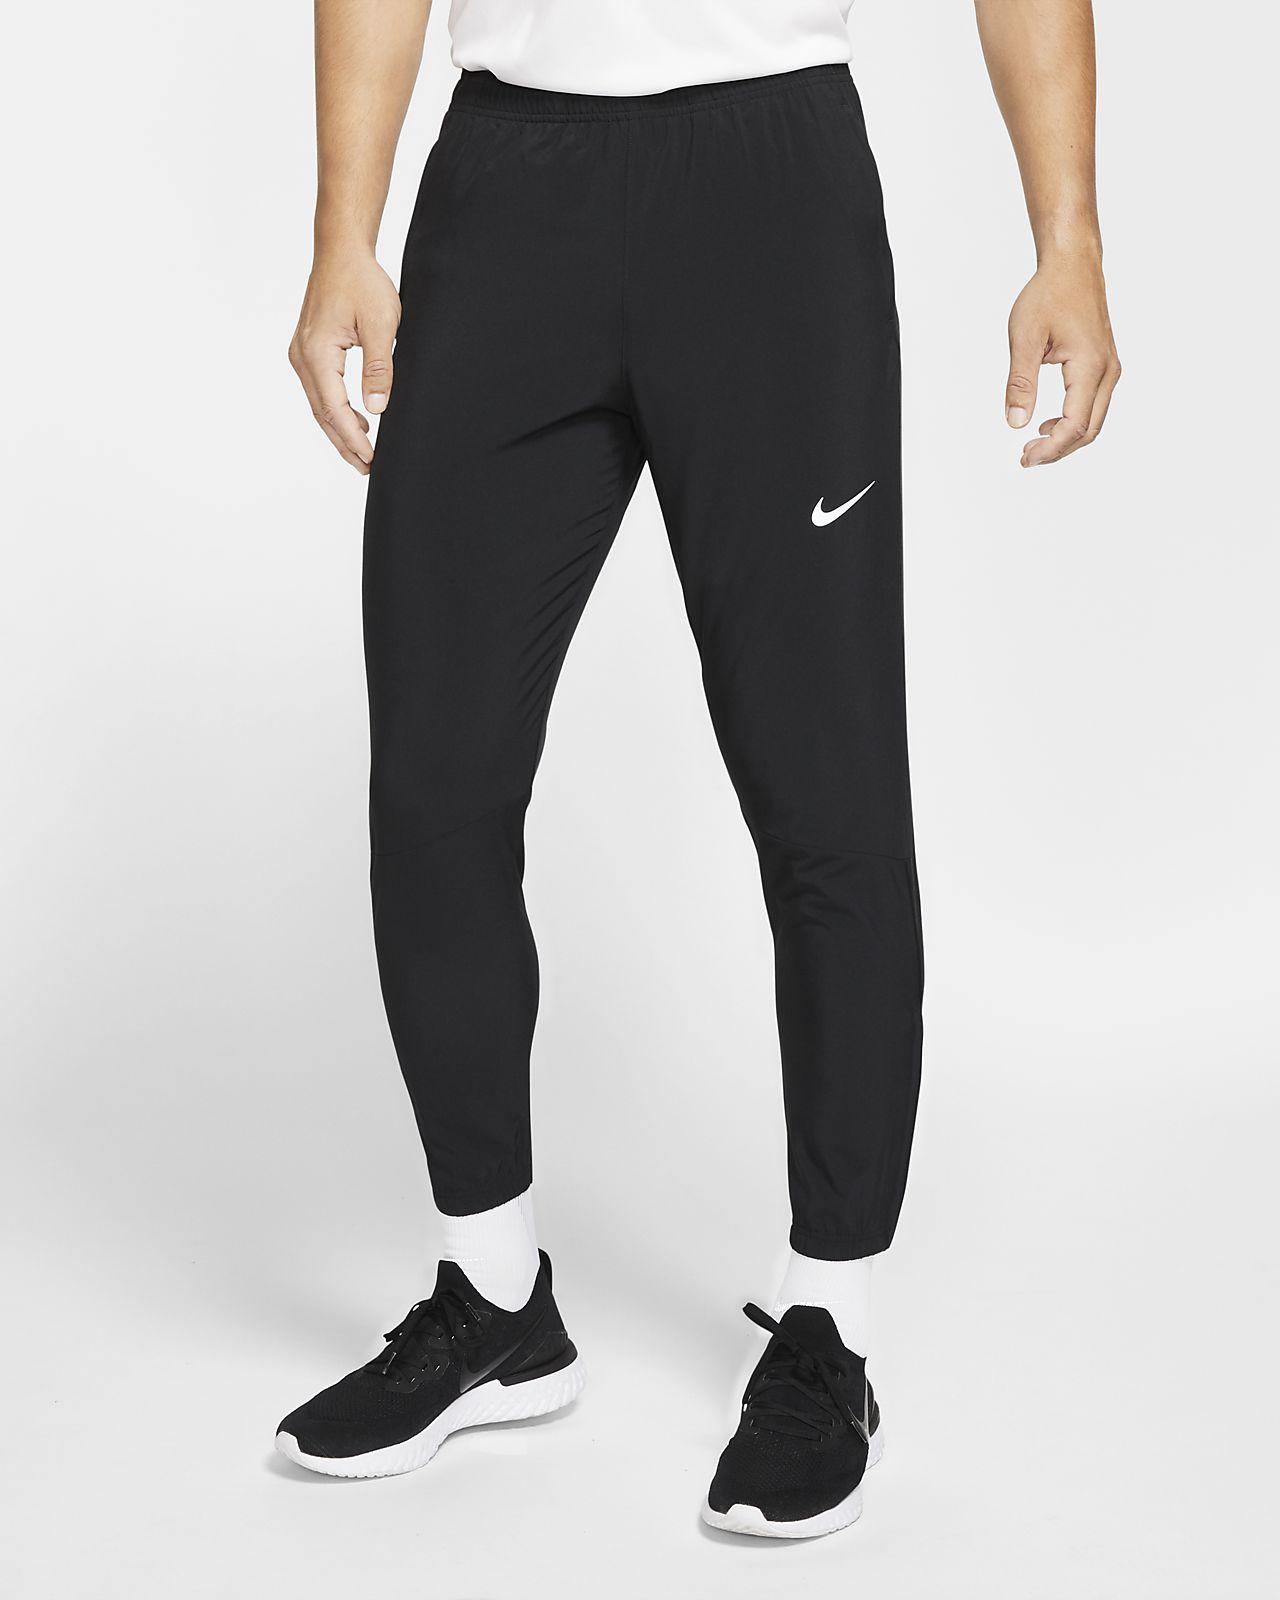 Nike Flex Essential Woven Pants Noir, Traininn